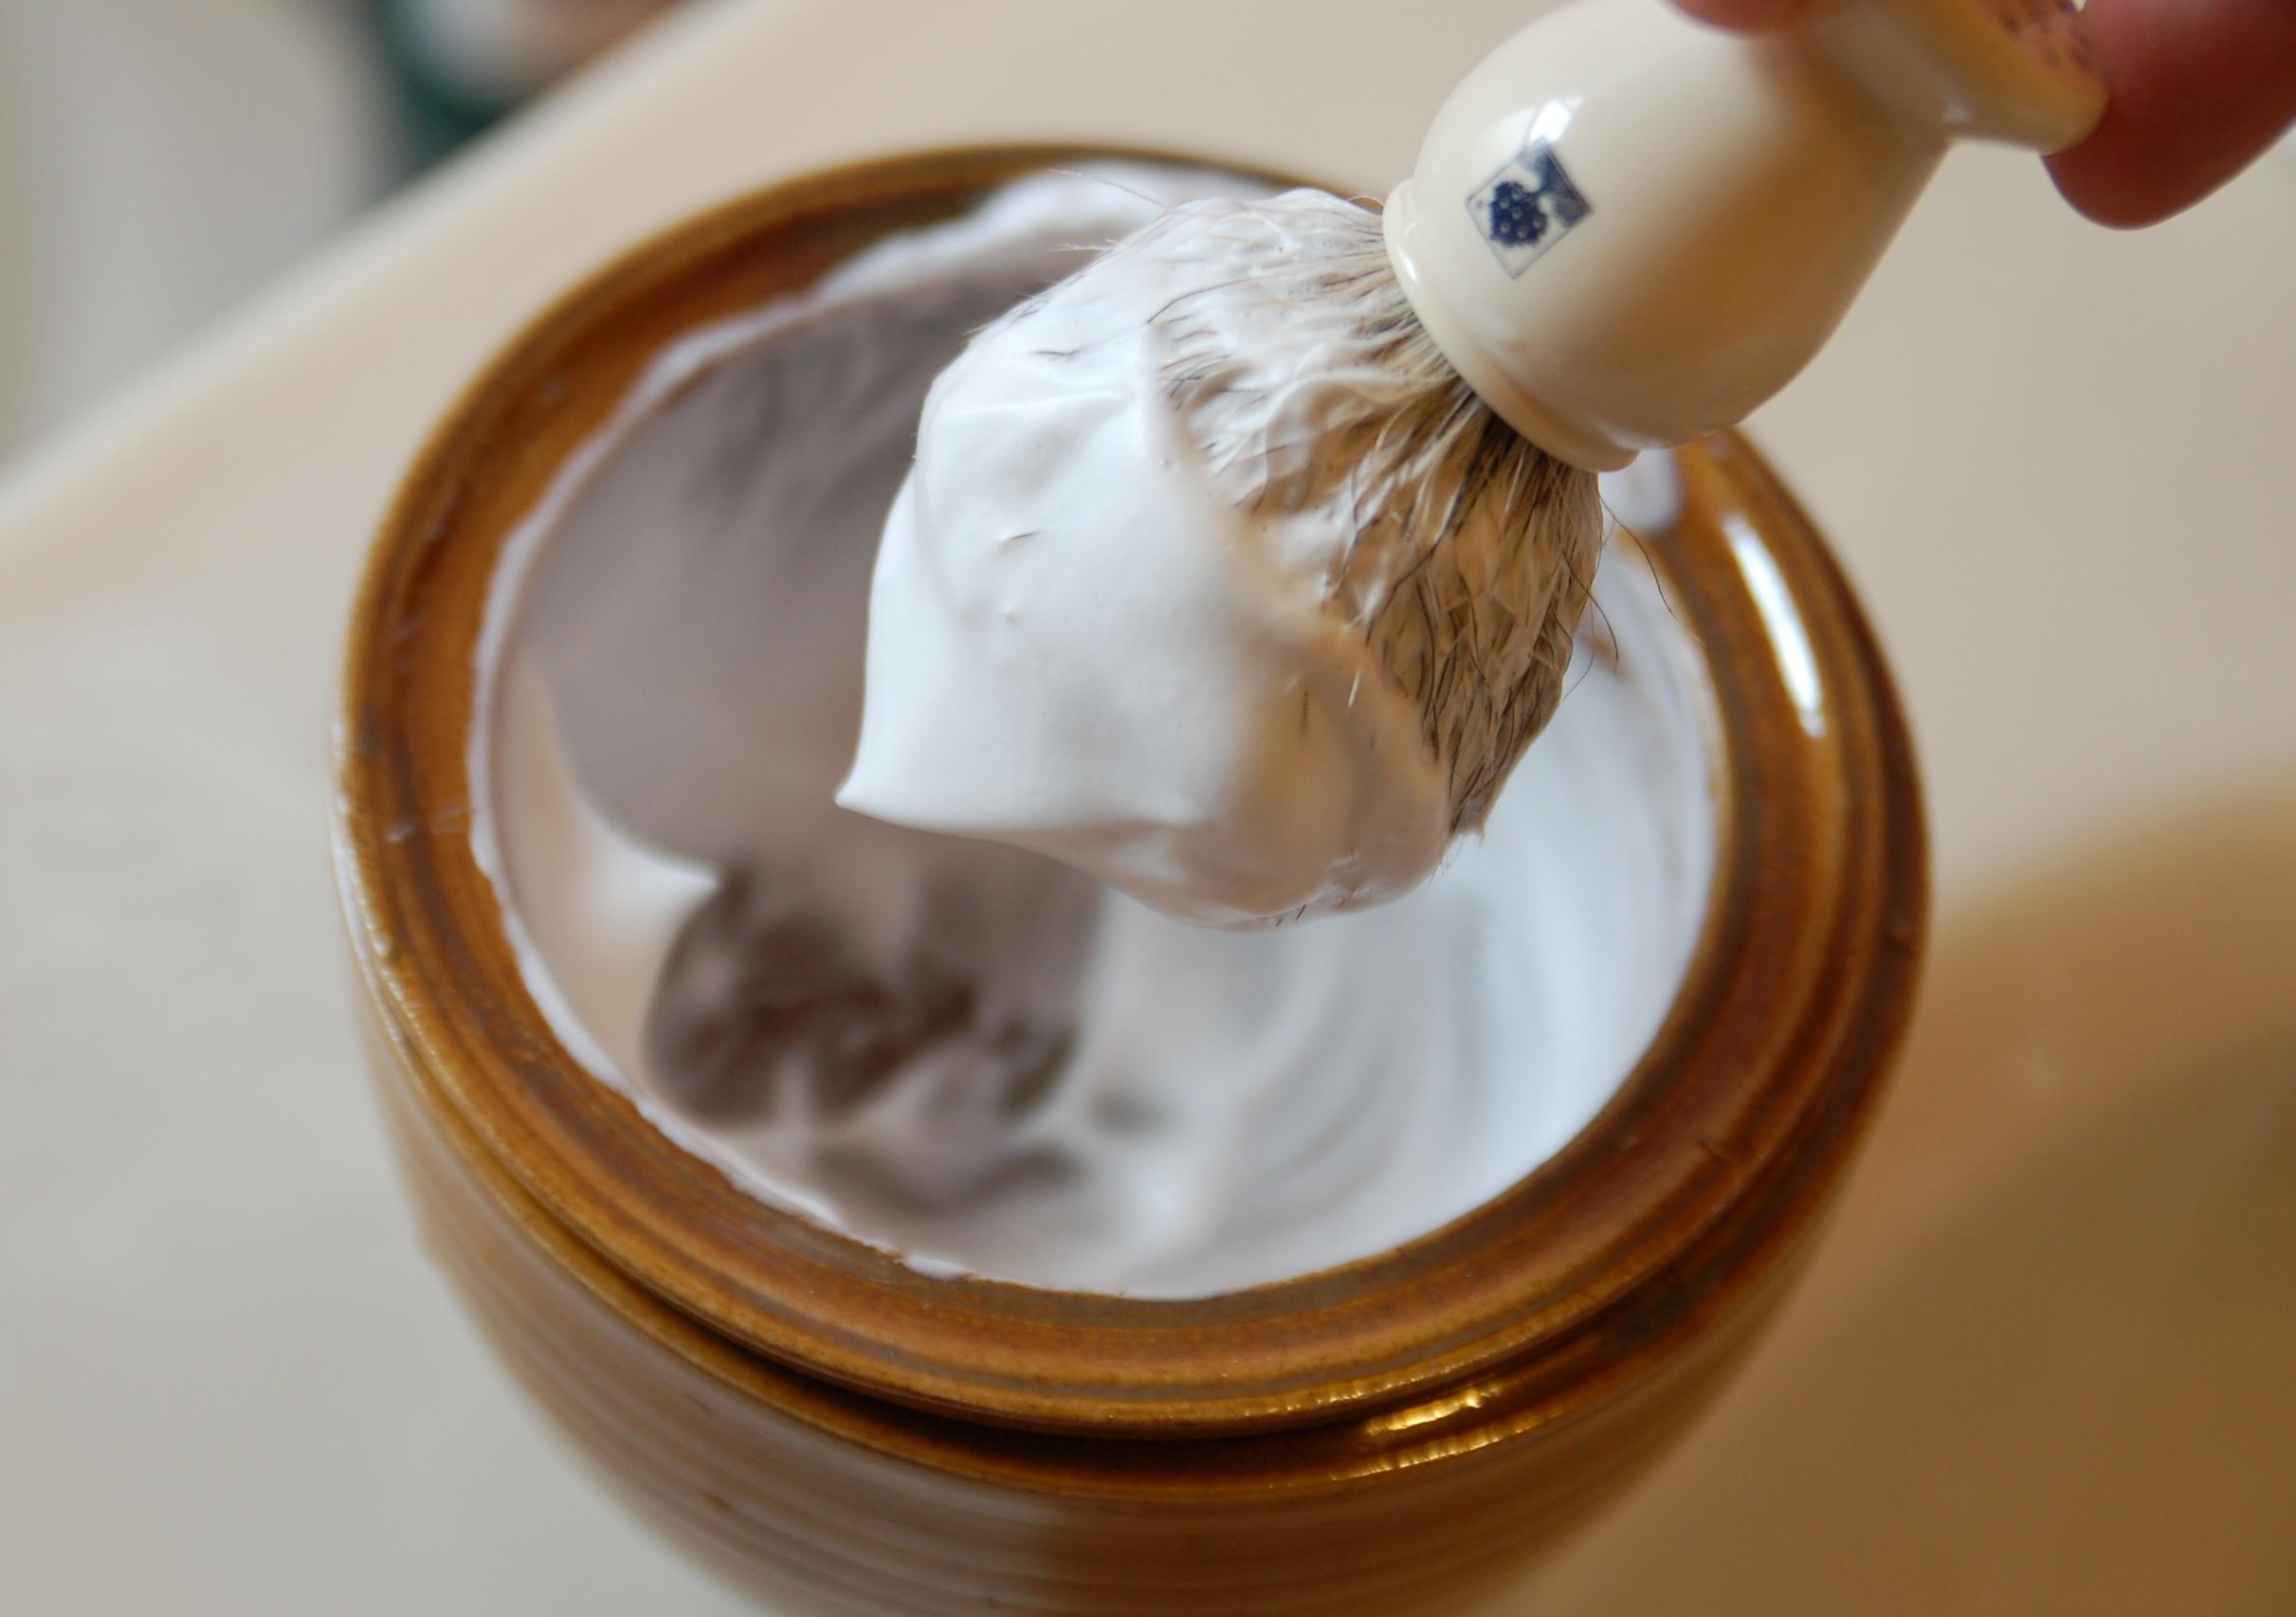 Depiction of Crema para afeitar